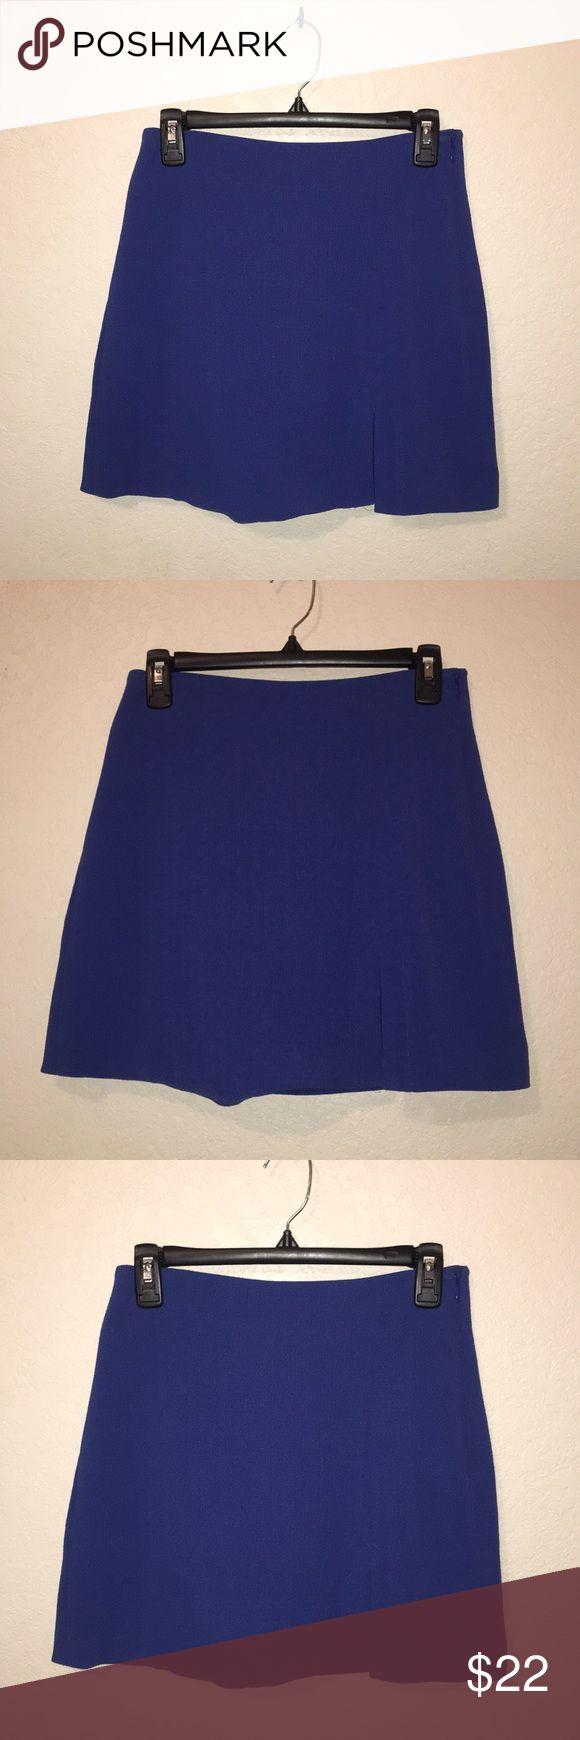 NWT. BCBG Generation. Blue mini skirt with slit 💙 NWT. BCBG Generation. Blue mini skirt with slit 💙 BCBGeneration Skirts Mini